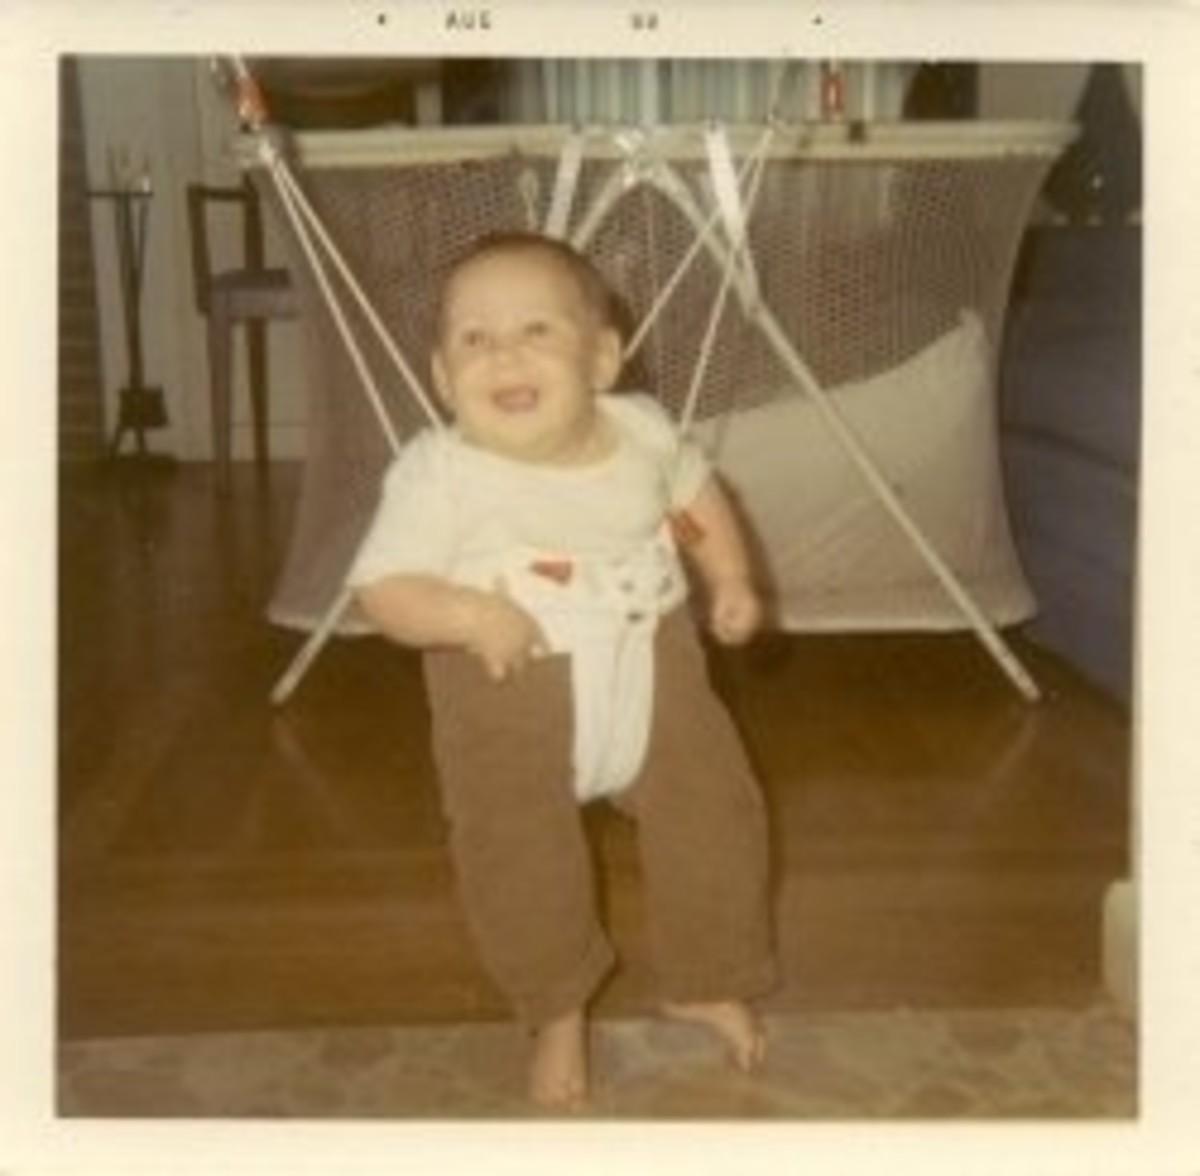 Me, sometime in 1969